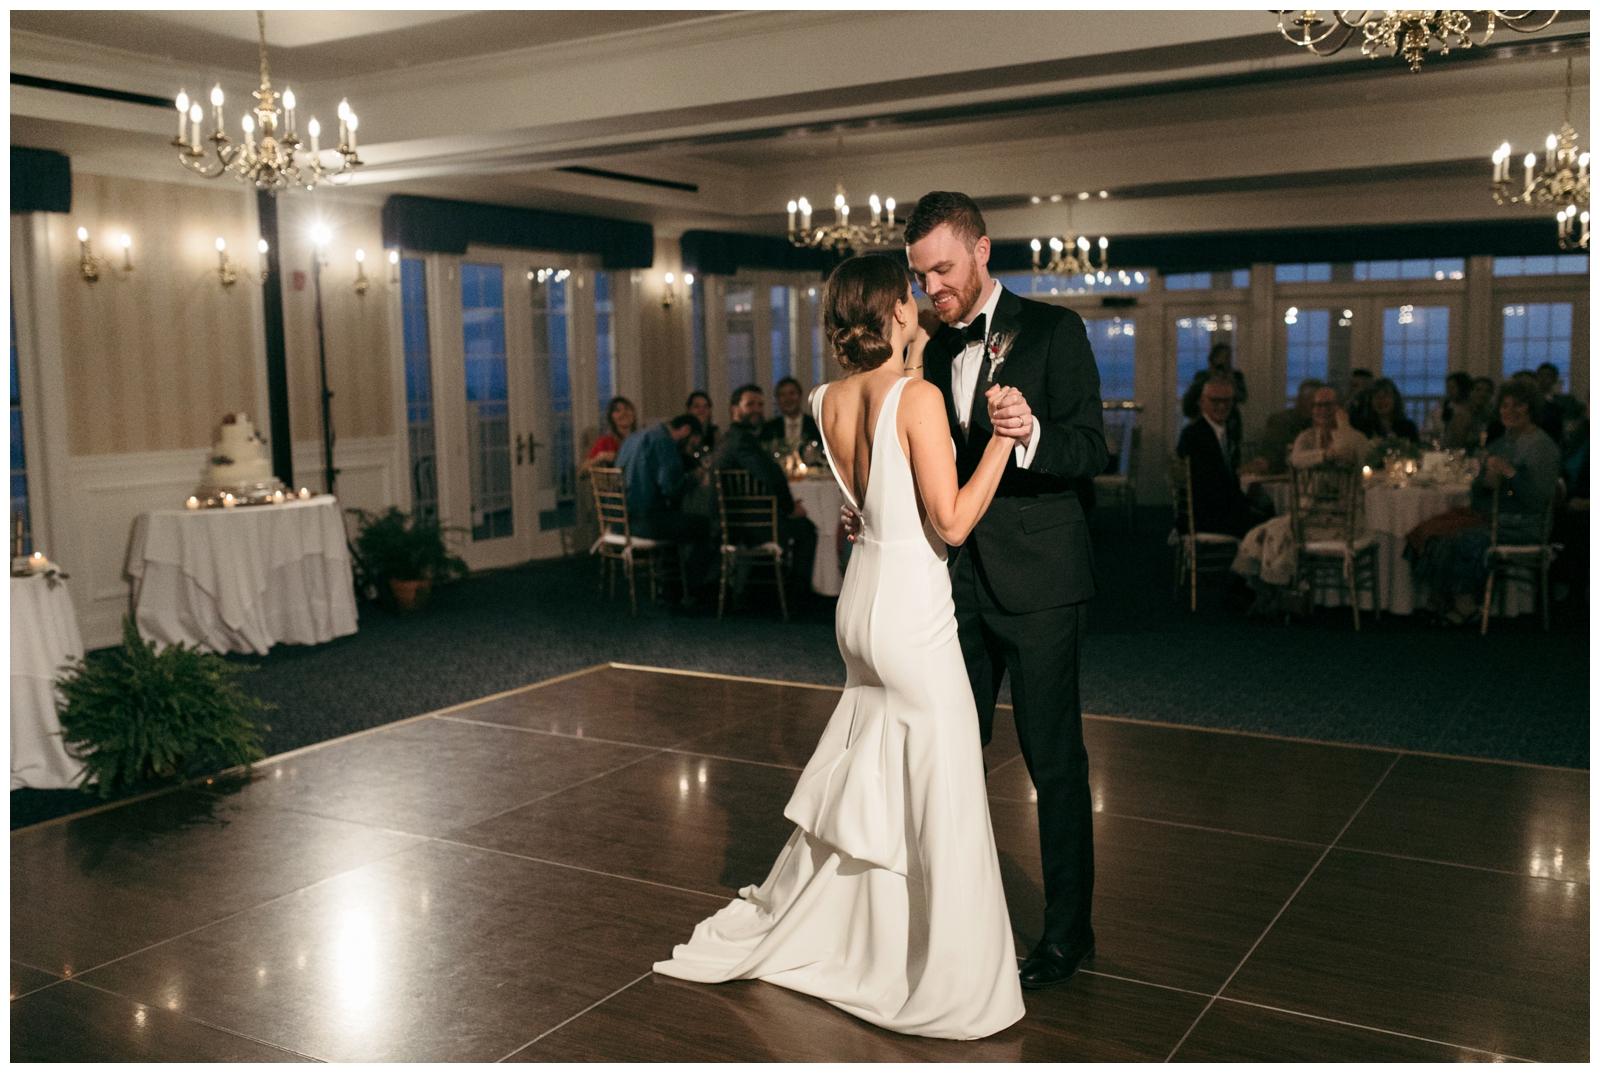 Madison-Beach-Hotel-Wedding-Bailey-Q-Photo-Boston-Wedding-Photographer-059.jpg